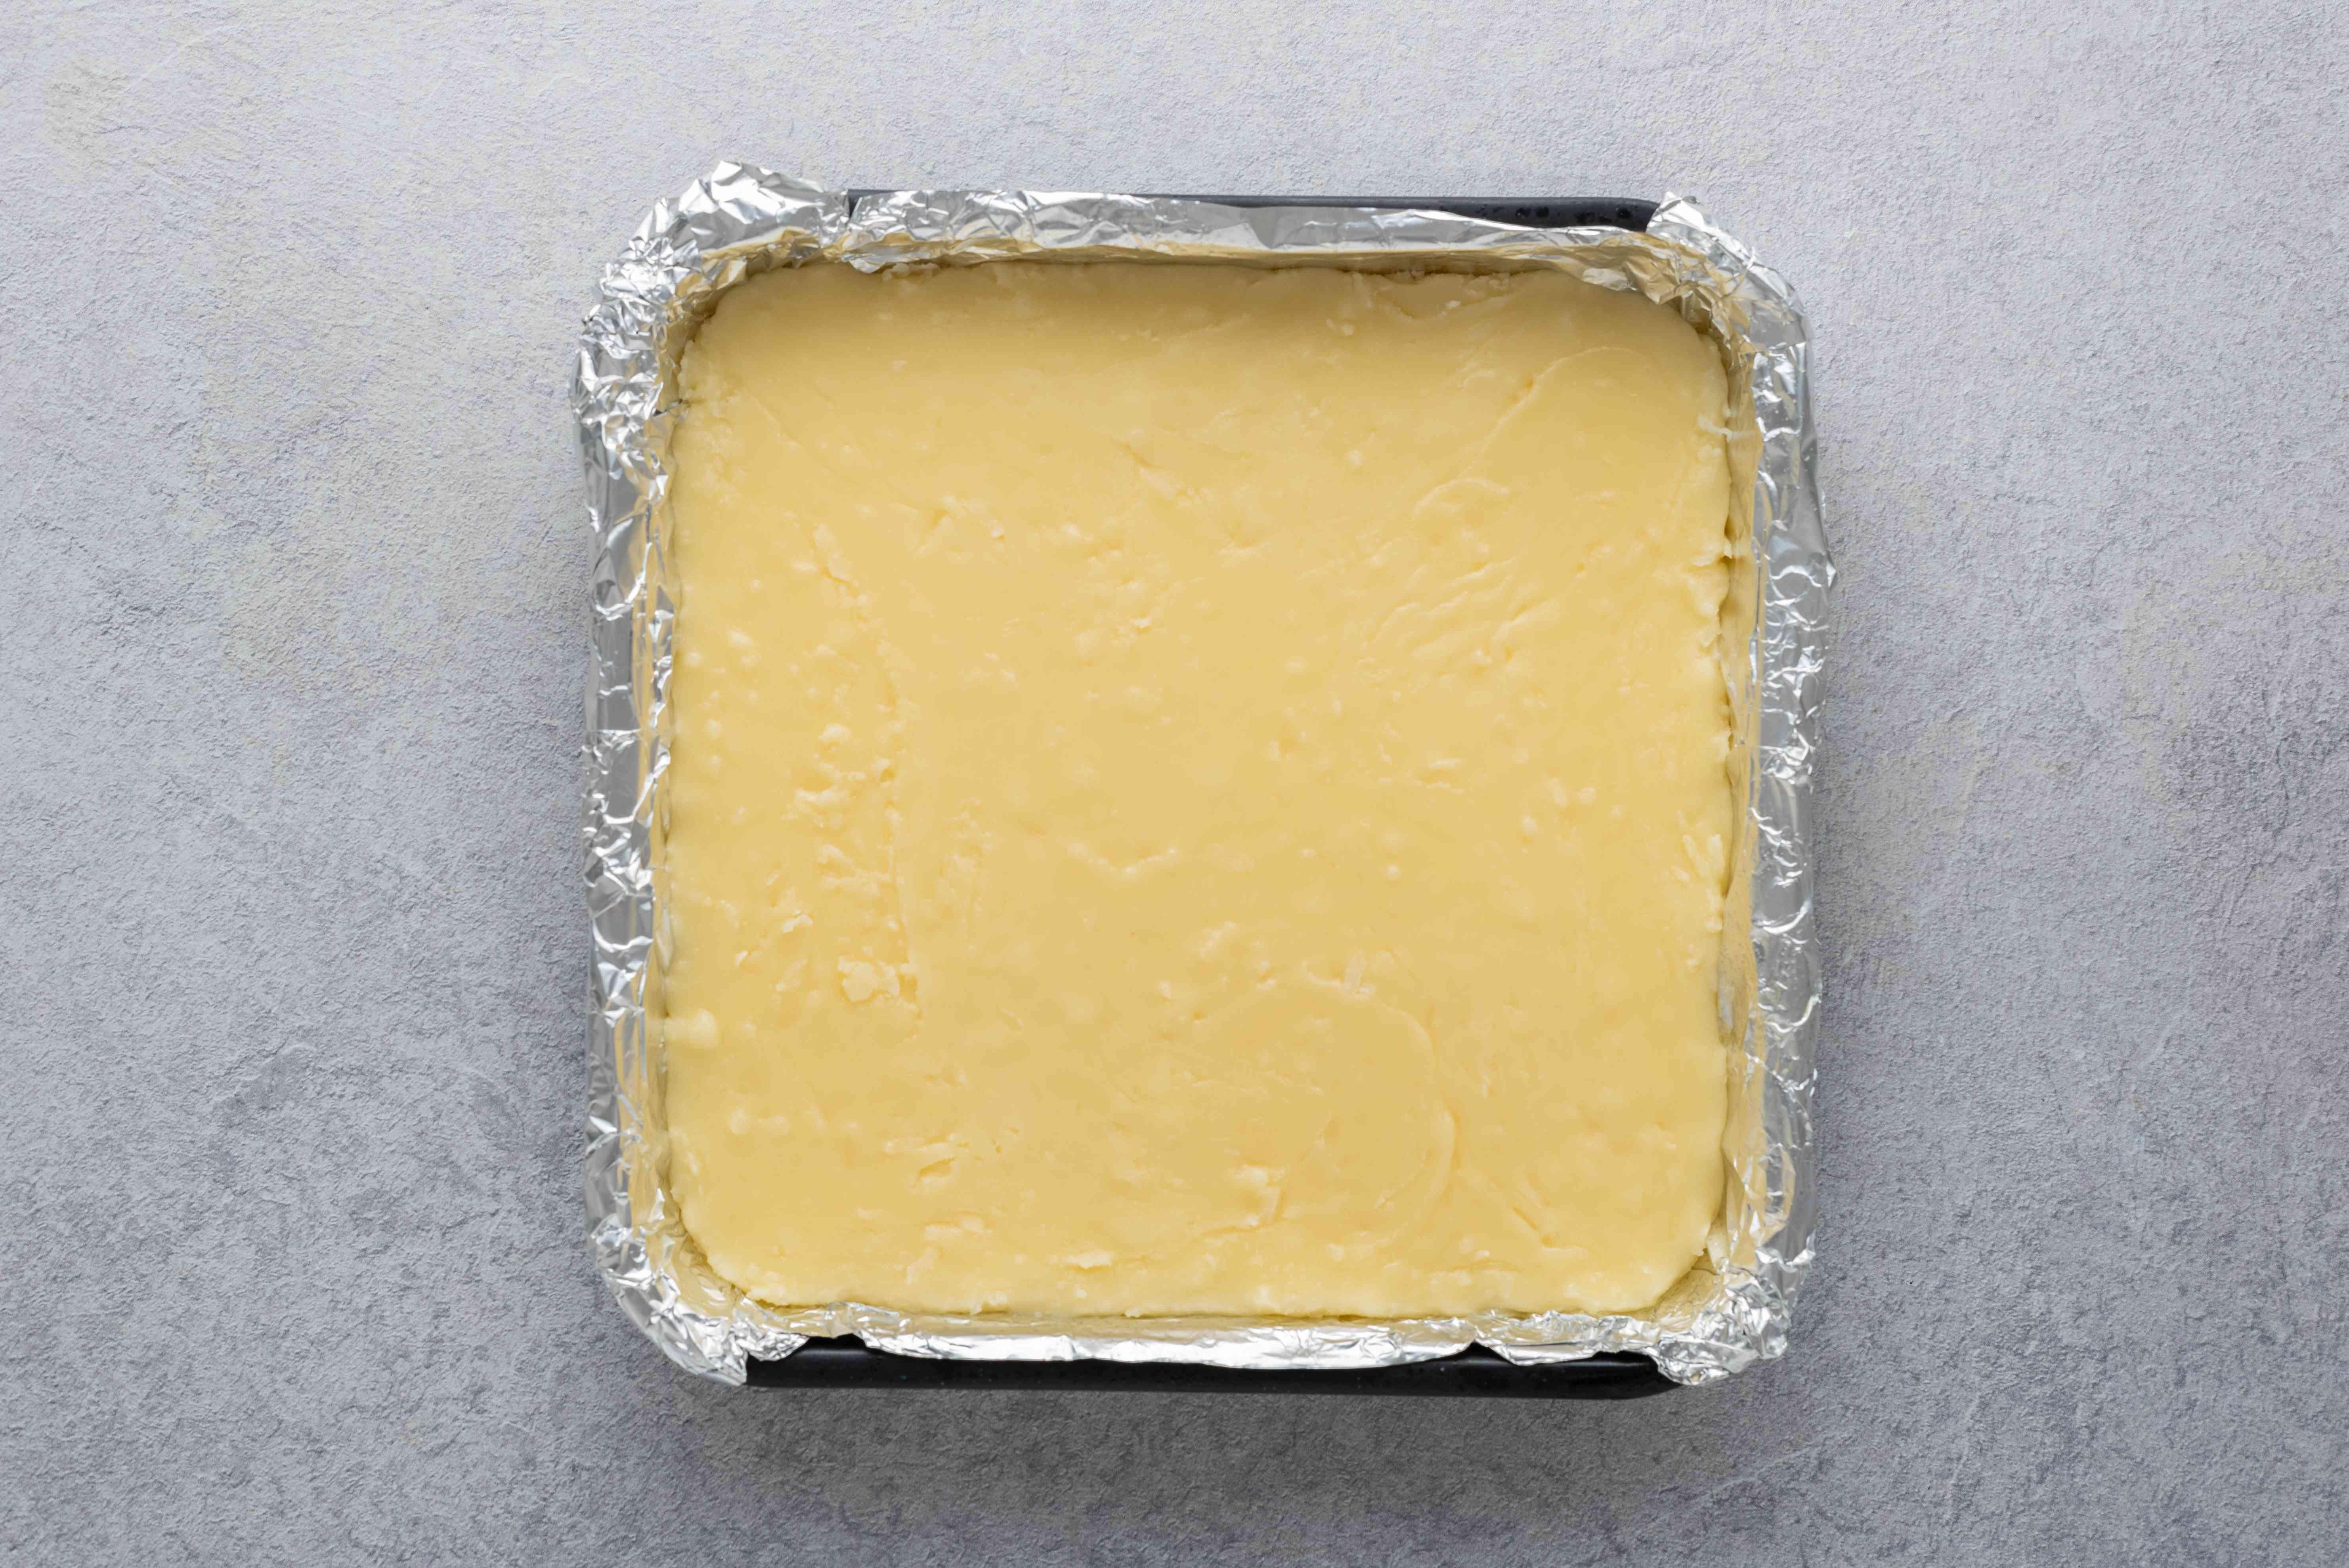 fudge in an aluminum foil lined baking pan